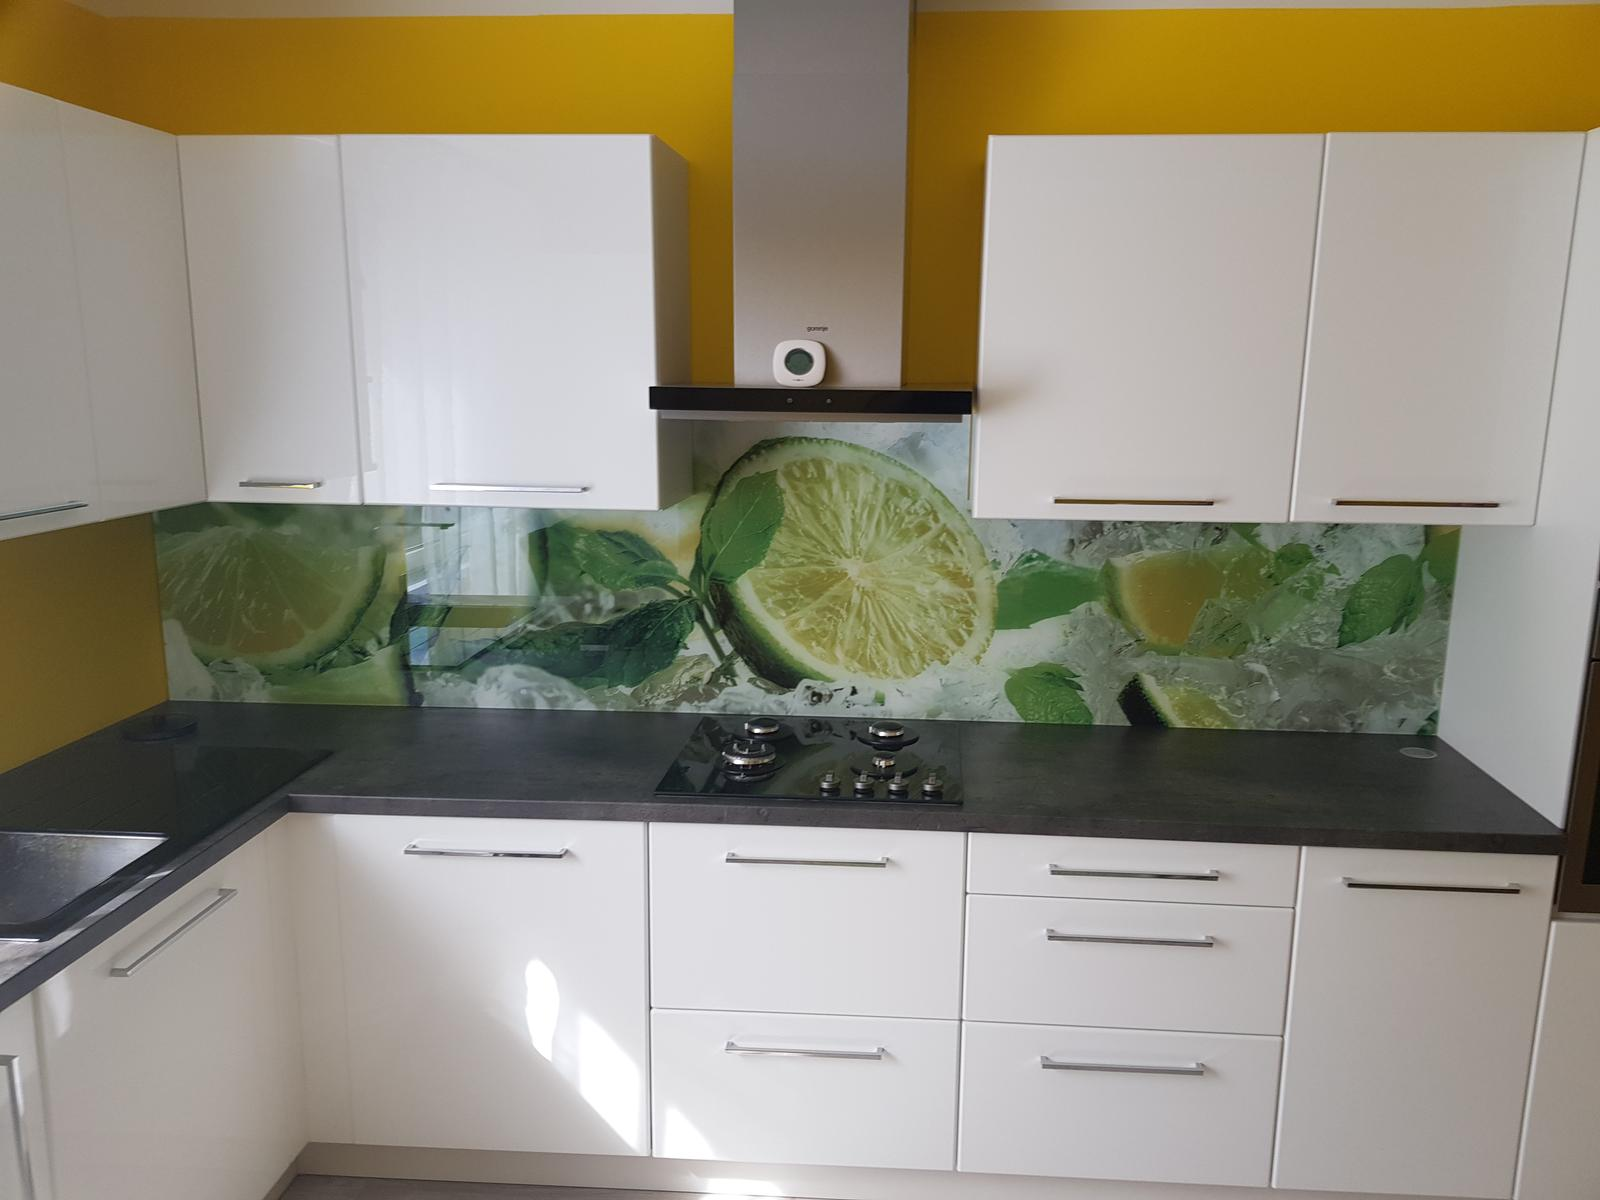 Dodávka a montáž sklenenej zásteny s motívom (Bučany). - Obrázok č. 4